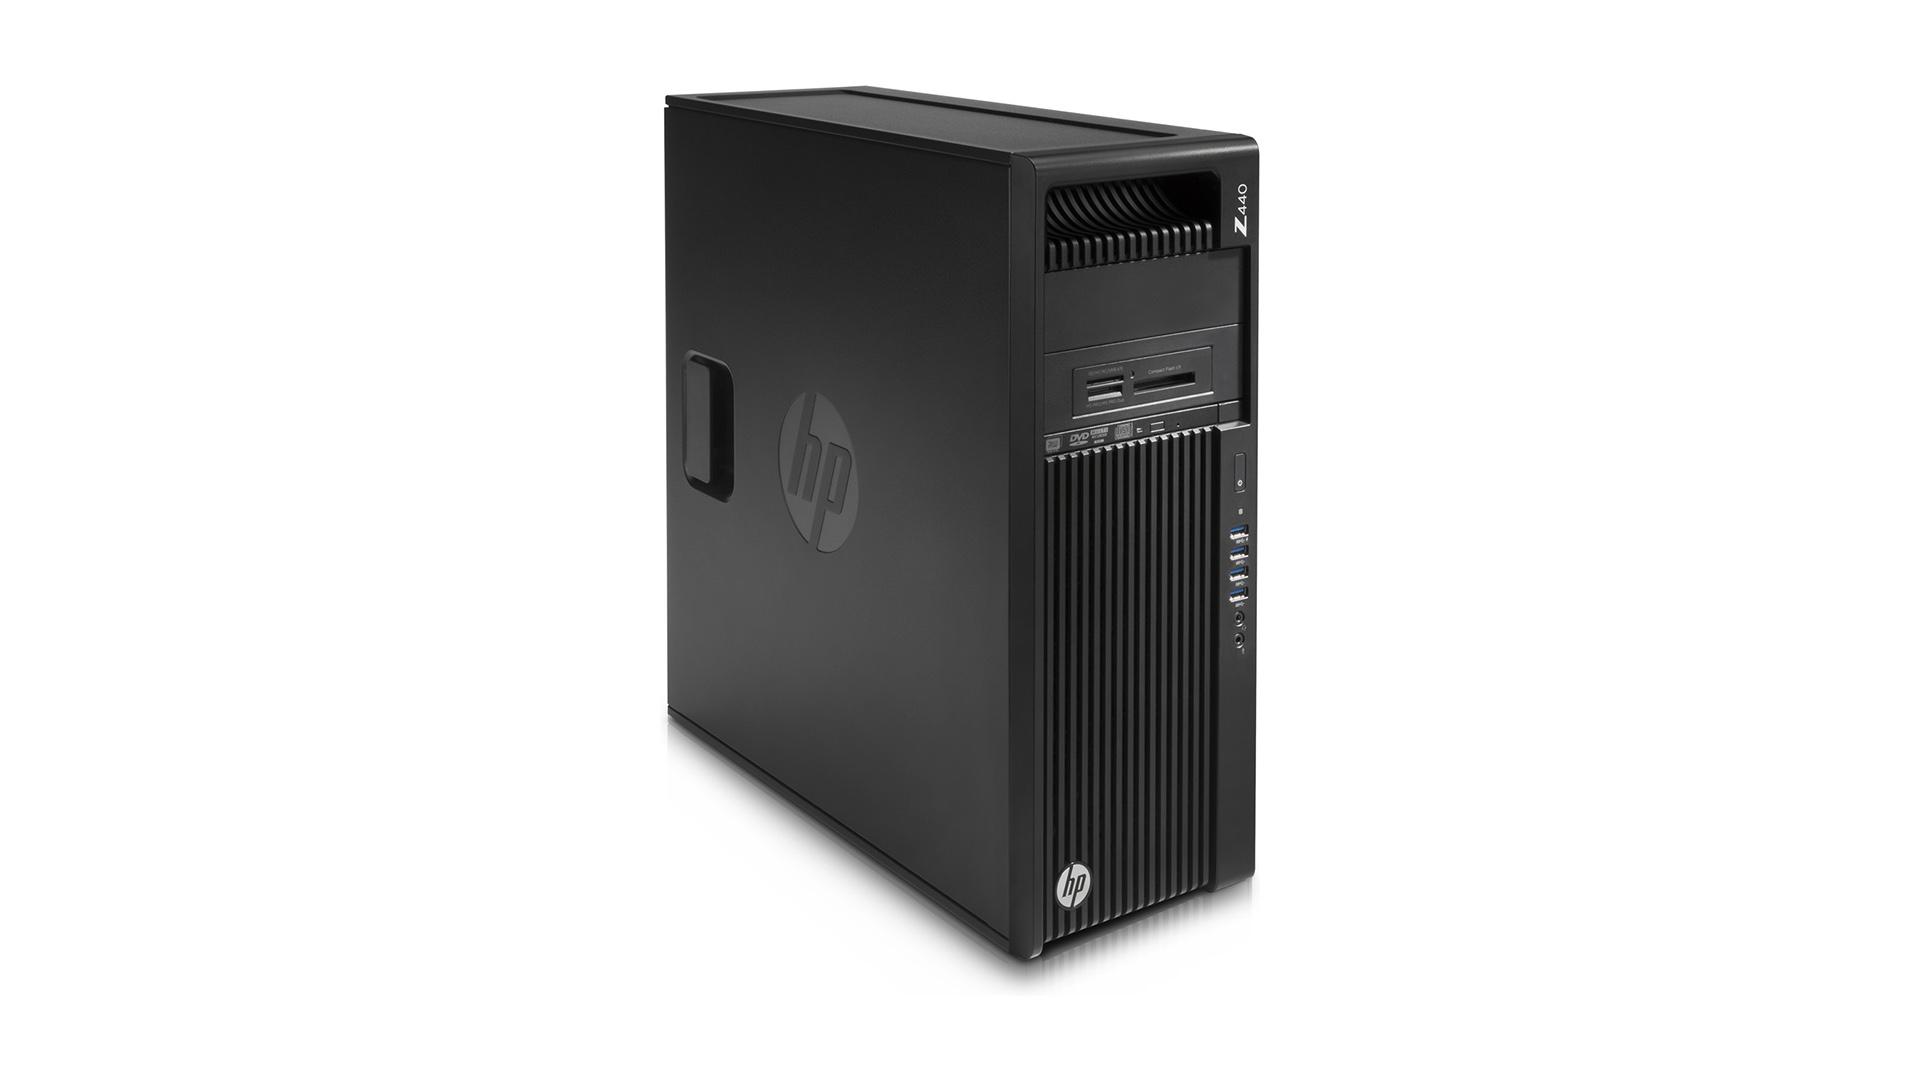 HP Z440 Desktop Workstation Expand your Power